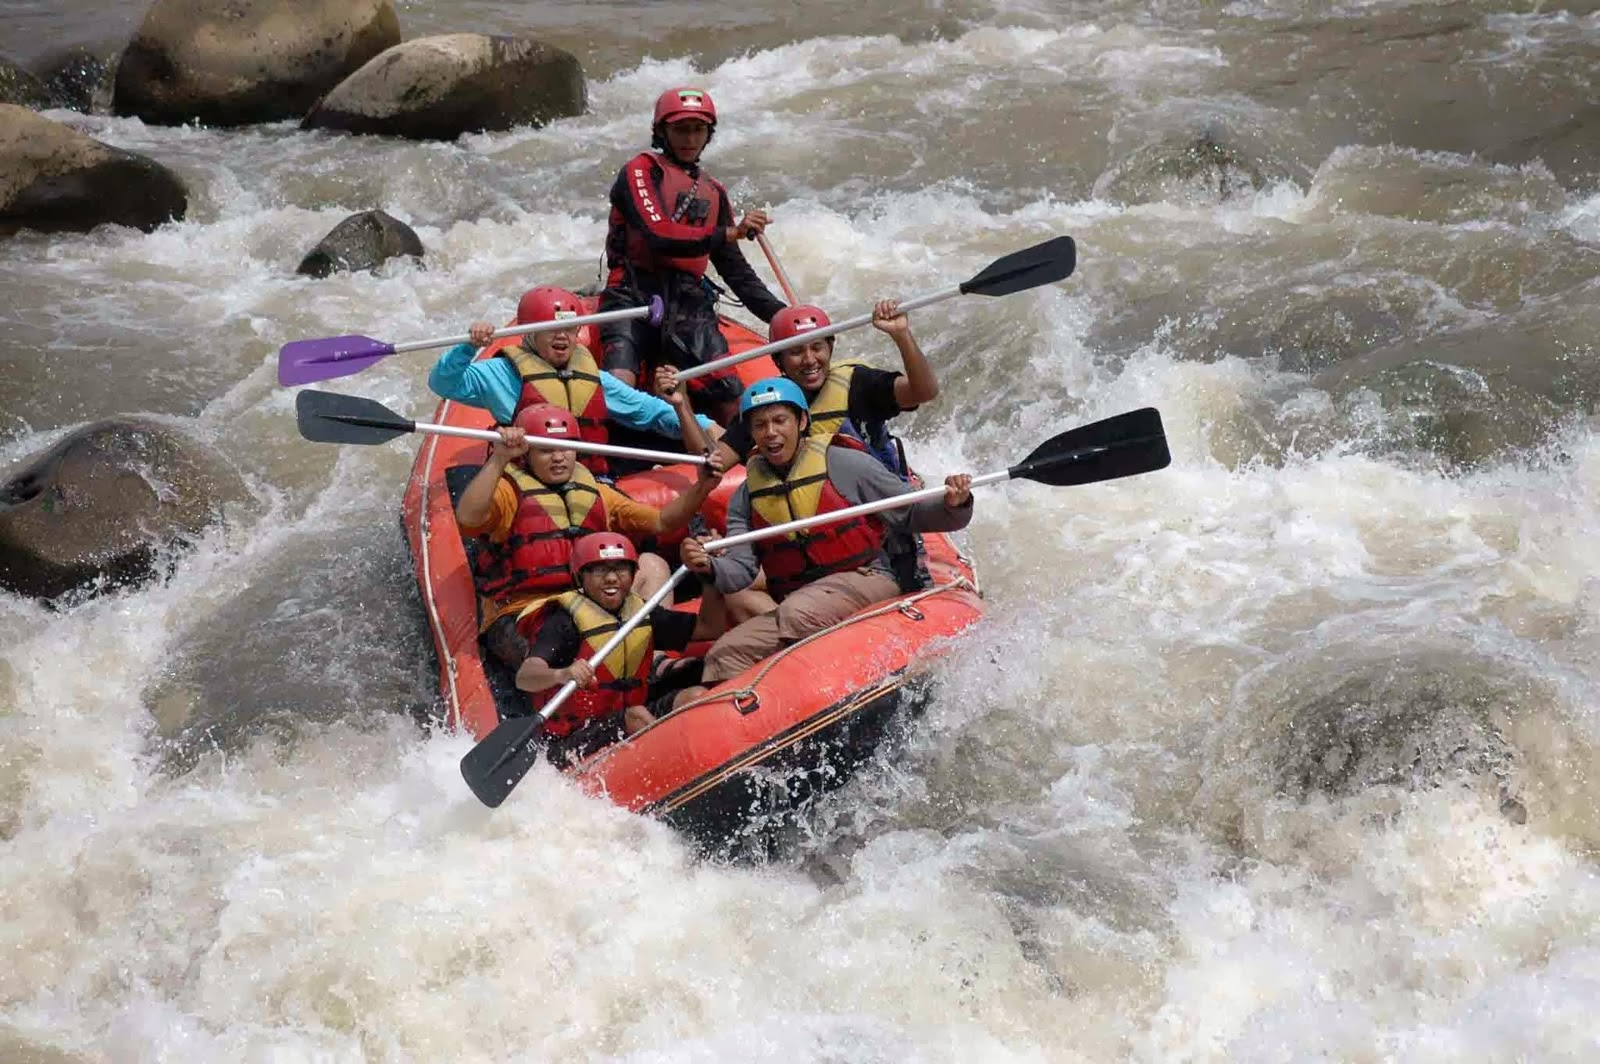 Serunya Rafting Sungai Serayu Banjarnegara